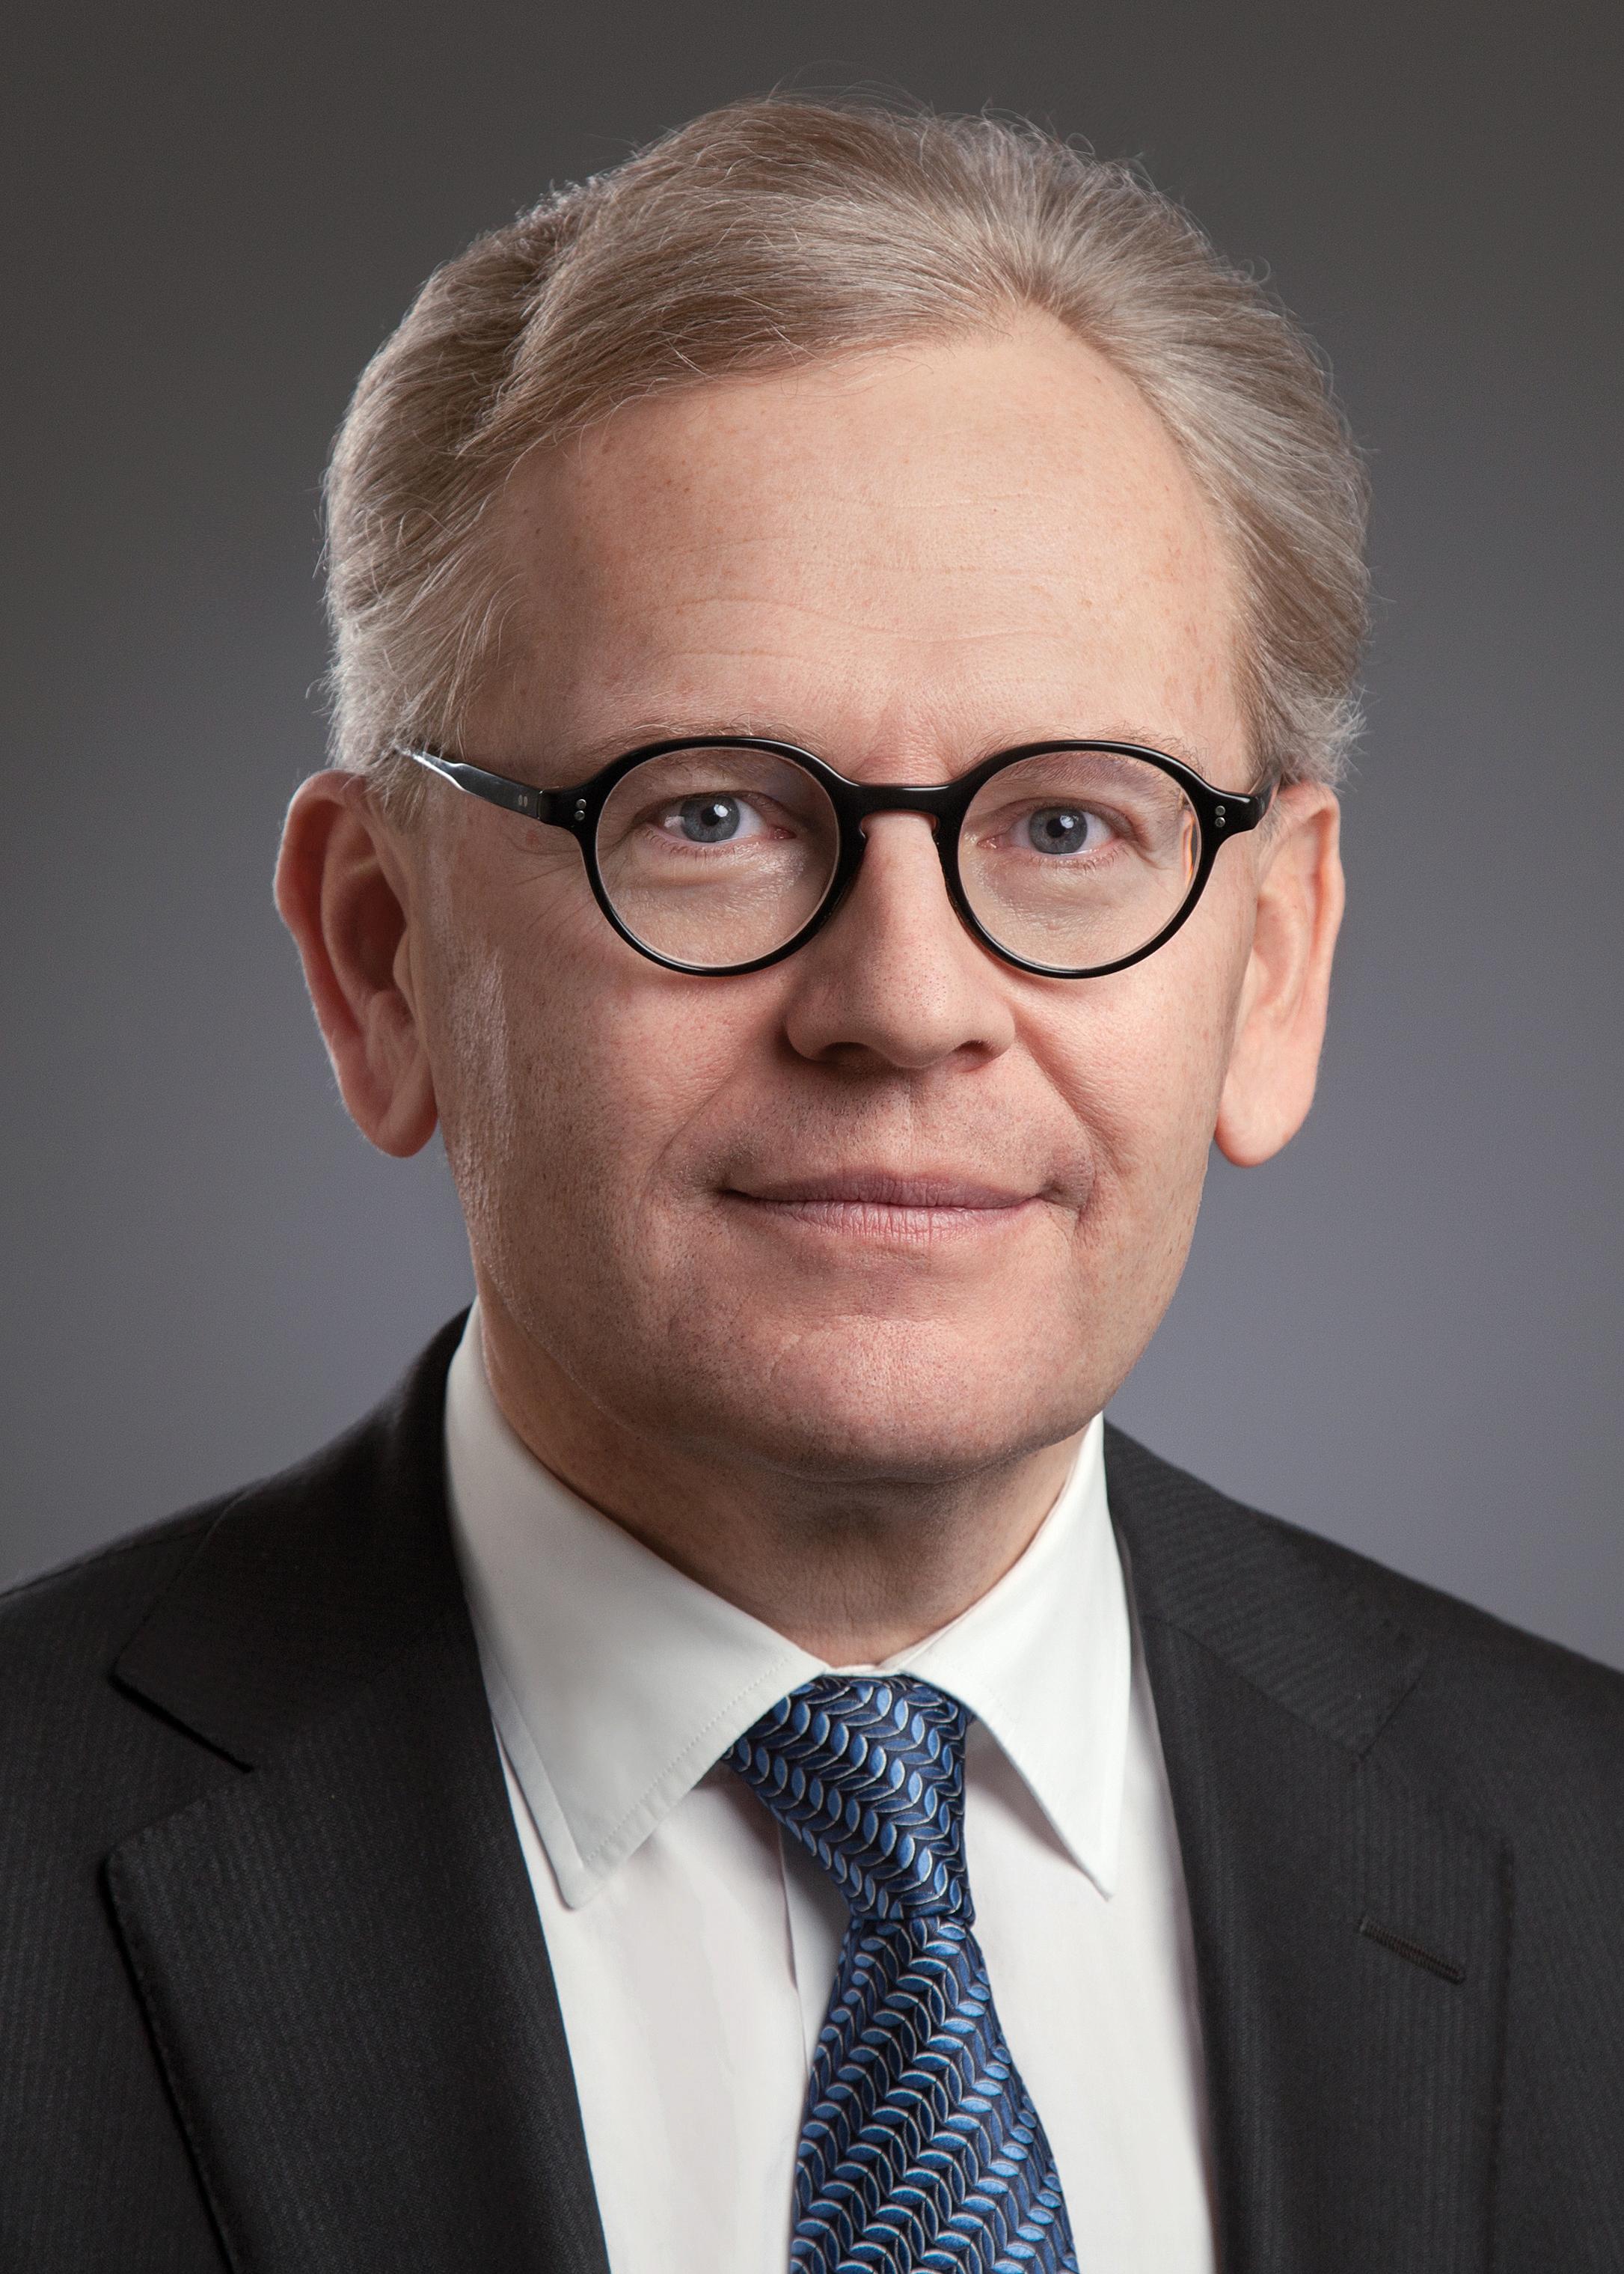 Portraitbild von Prof. Dr. Michael Roden